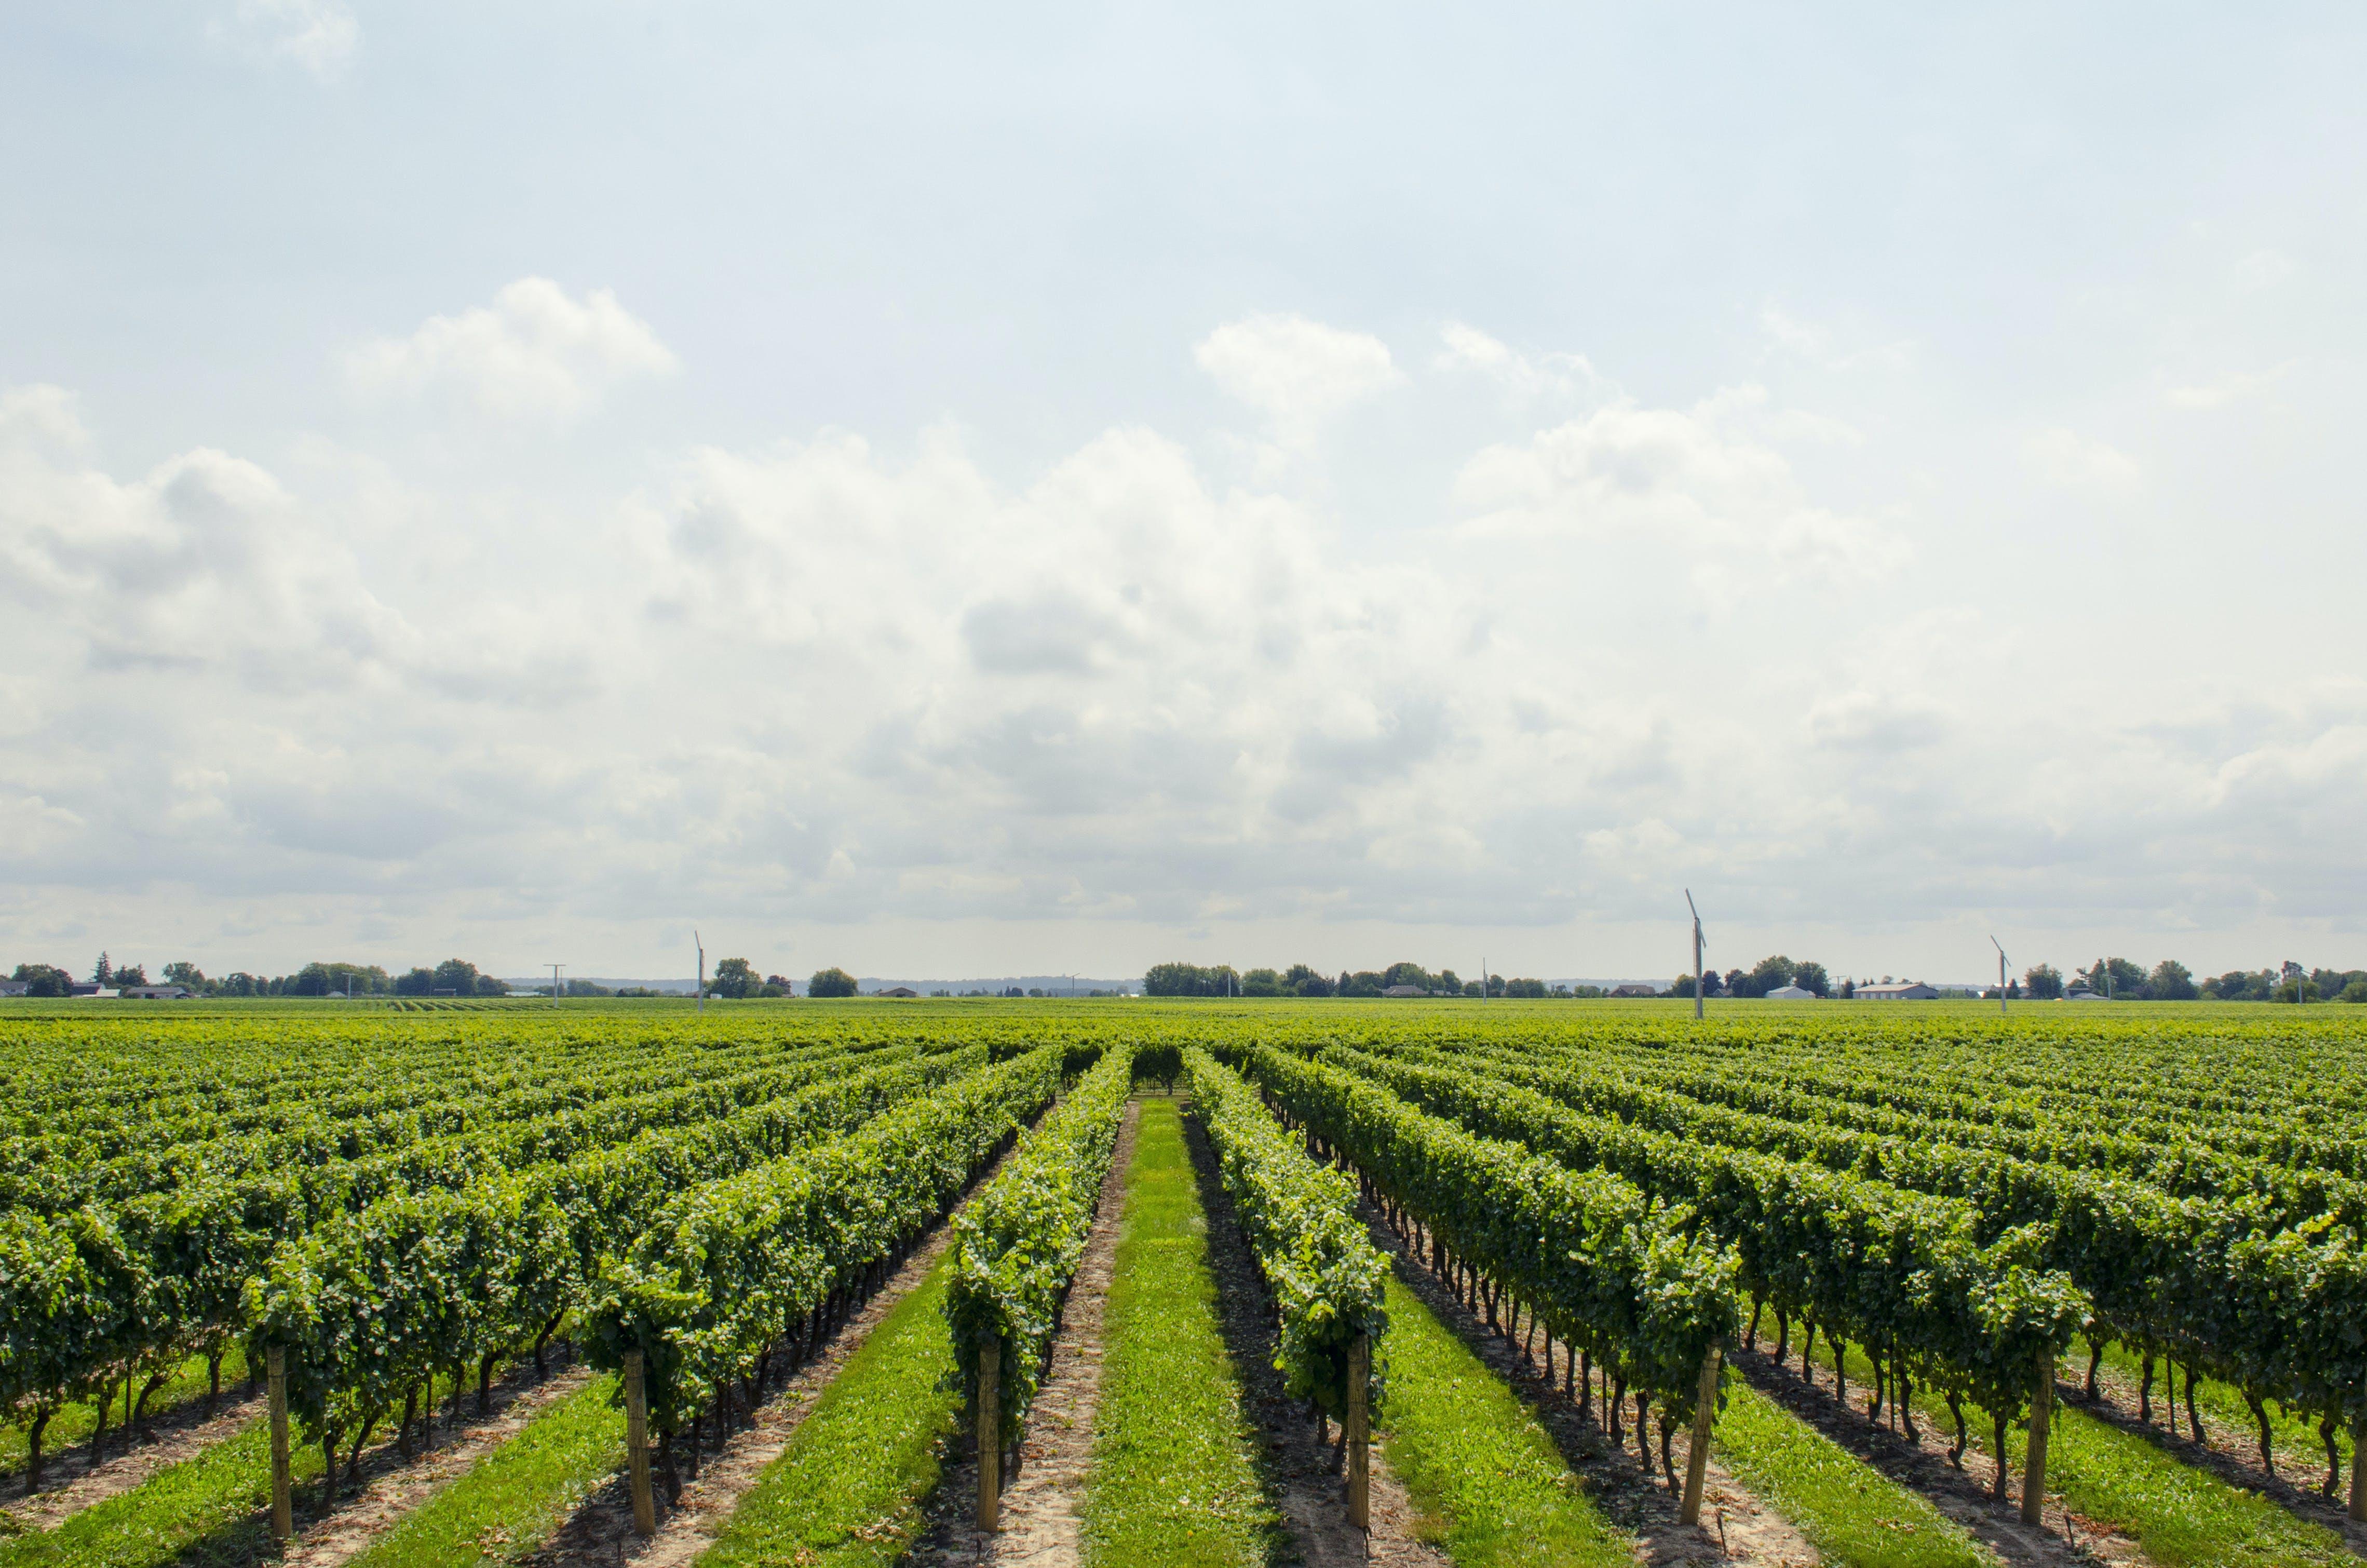 bauernhof, farm, himmel